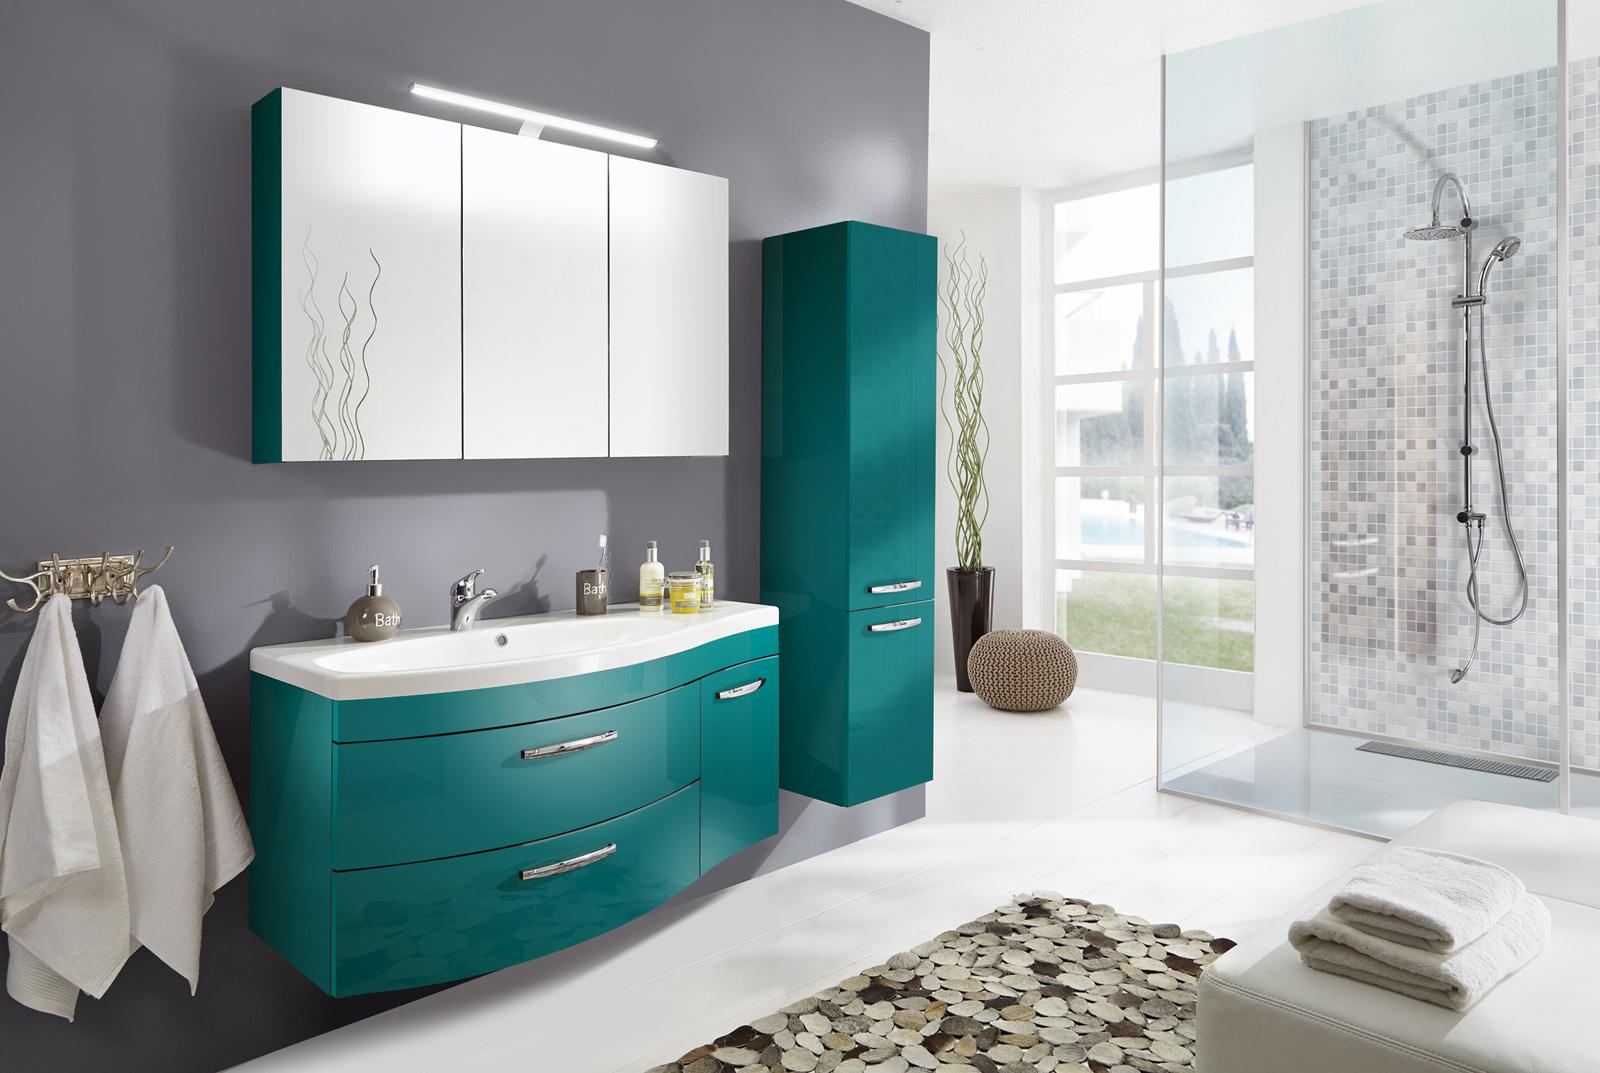 Badezimmer set türkis – midir